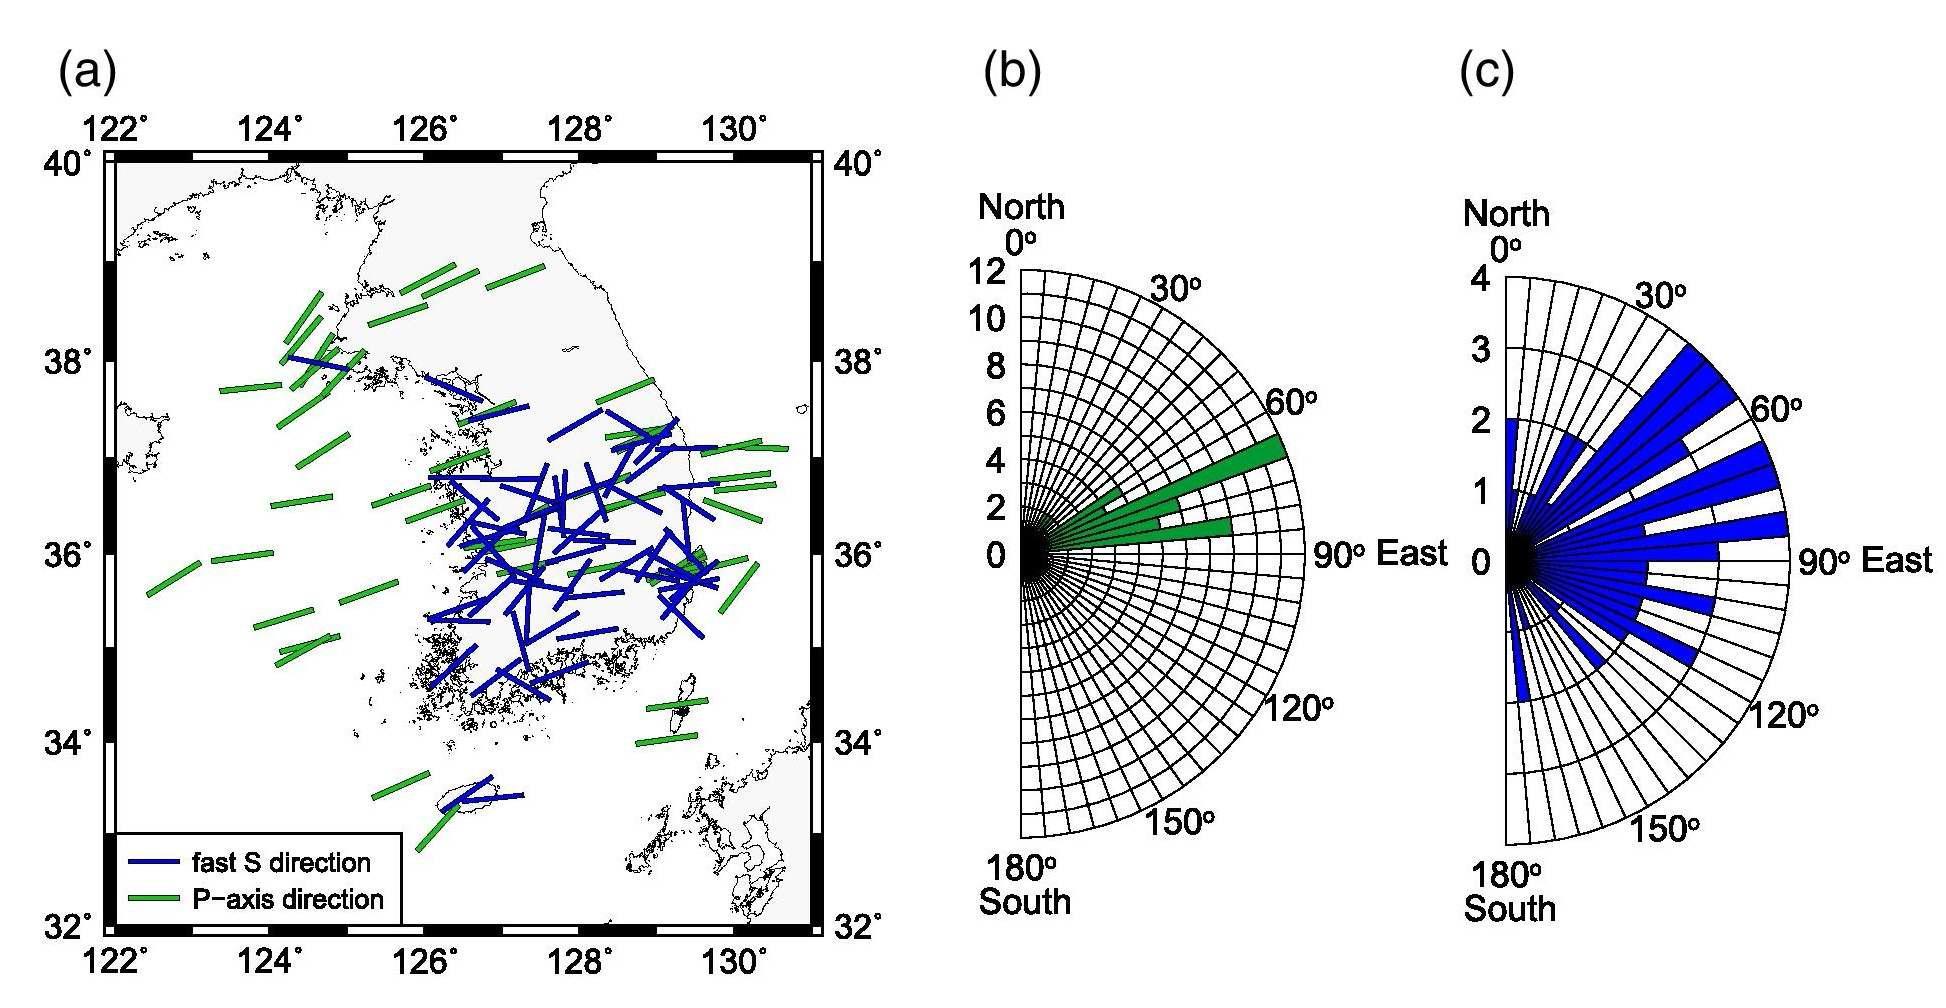 (a) 한반도 주변 압축력 축 방향 (초록 막대) 그리고 빠른 횡파 방향 (푸른 막대) 사이의 비교. 압축 력 축 방향은 단층 면 해로부터 계산되었다. 한반도에서의 (b) 압축력 방향과 (c) 빠른 횡파 방향의 장미도표. 빠른 횡파 방향은 그 지역의 압축력 축 방향과 유사하다.